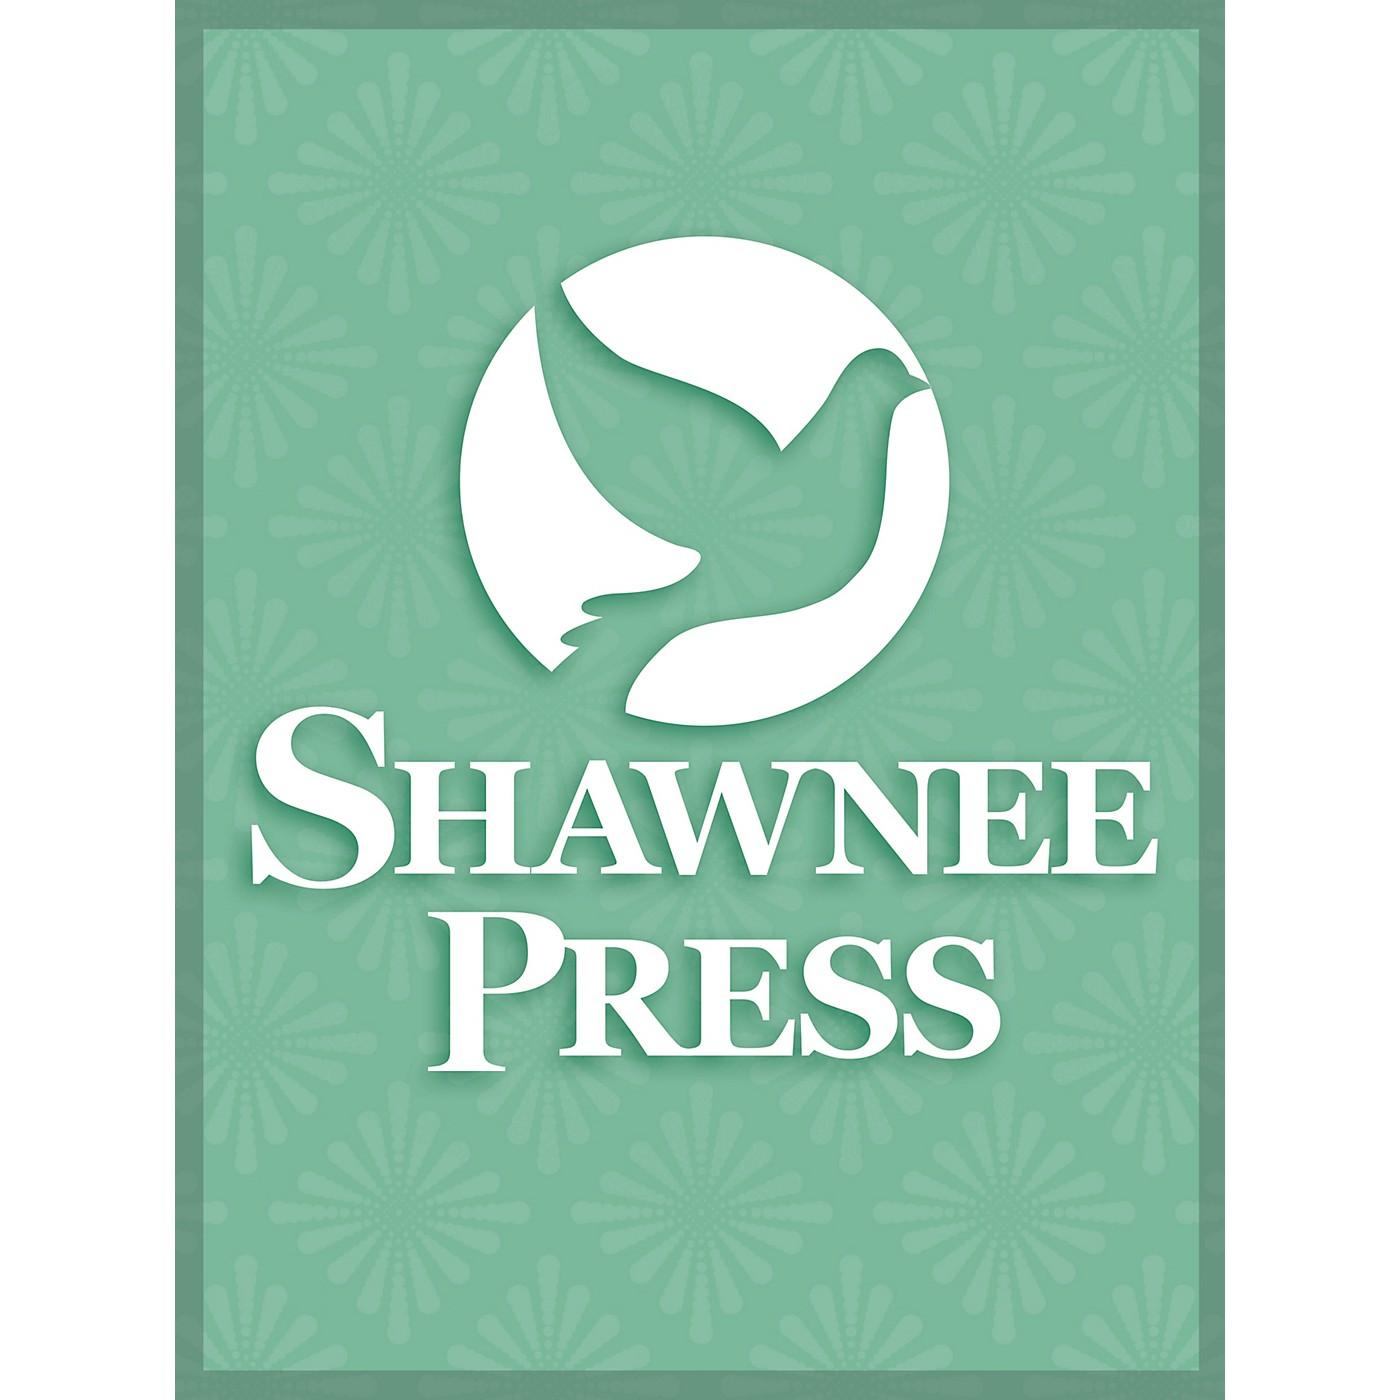 Shawnee Press Song of Stewardship, A (SATB) SATB Arranged by Taulman thumbnail